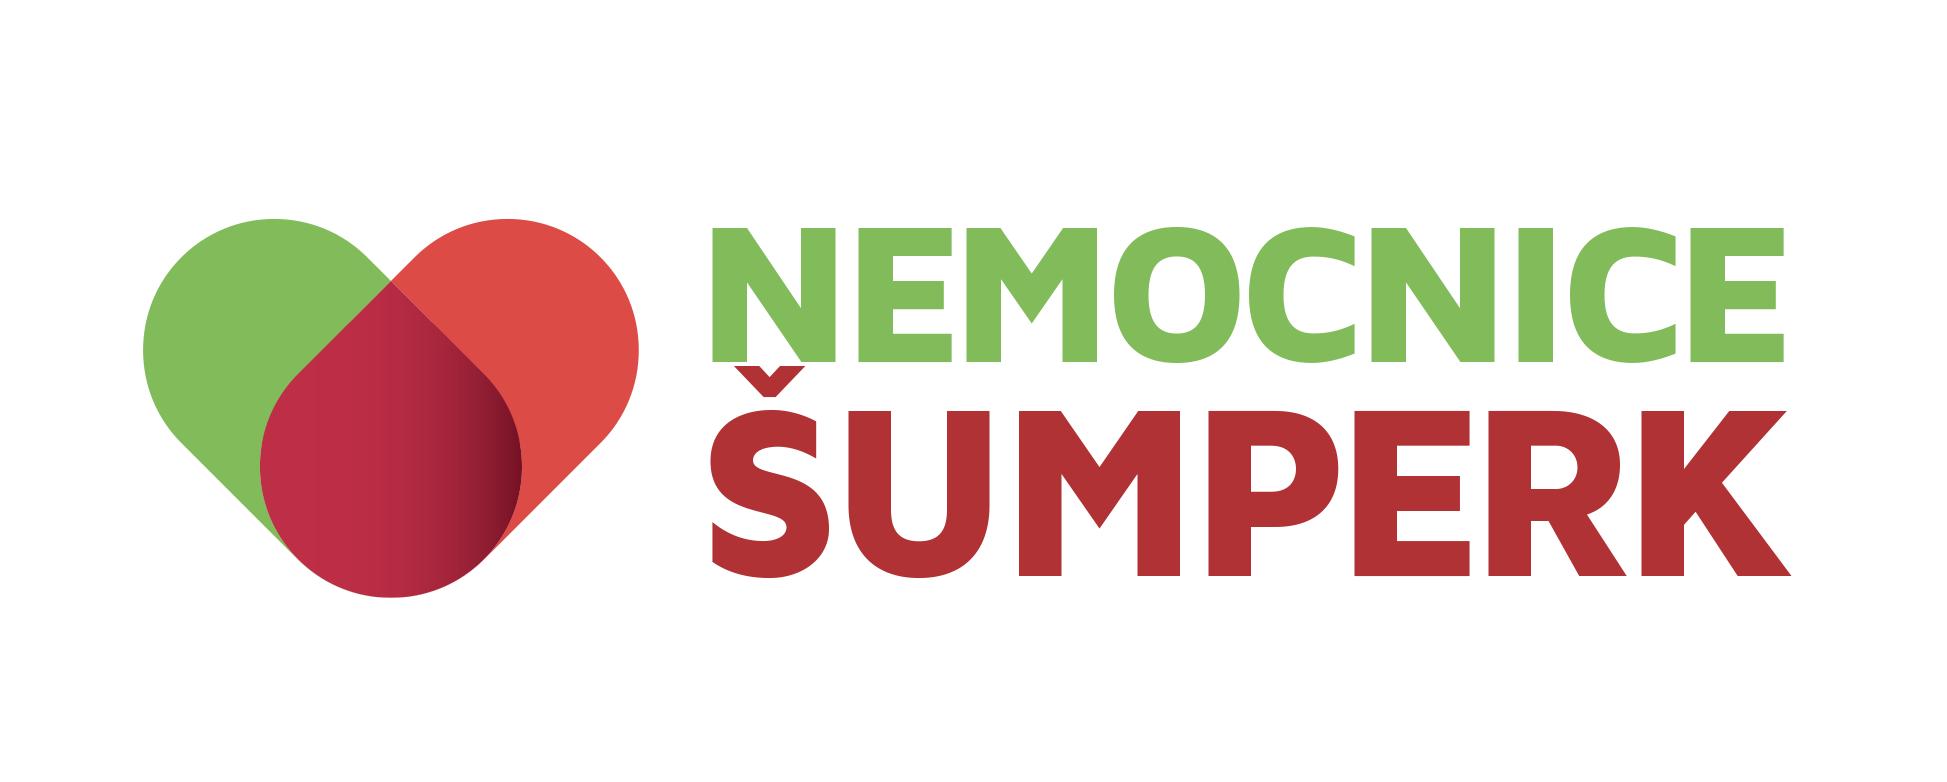 LOGO NEMOCNICE ŠUMPERK_final